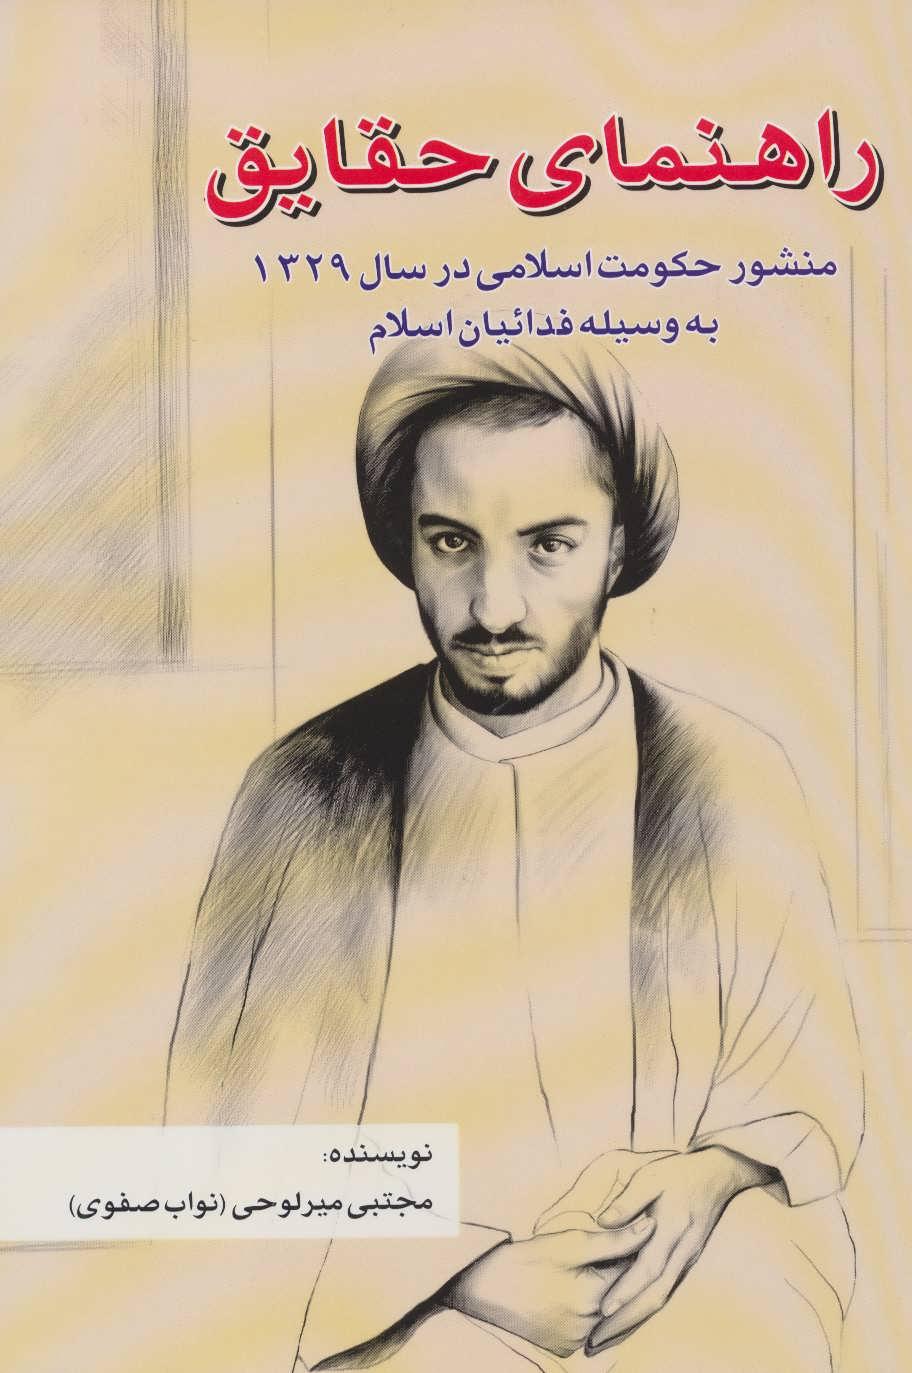 راهنماي حقايق (منشور حكومت اسلامي در سال 1329 به وسيله فدائيان اسلام)